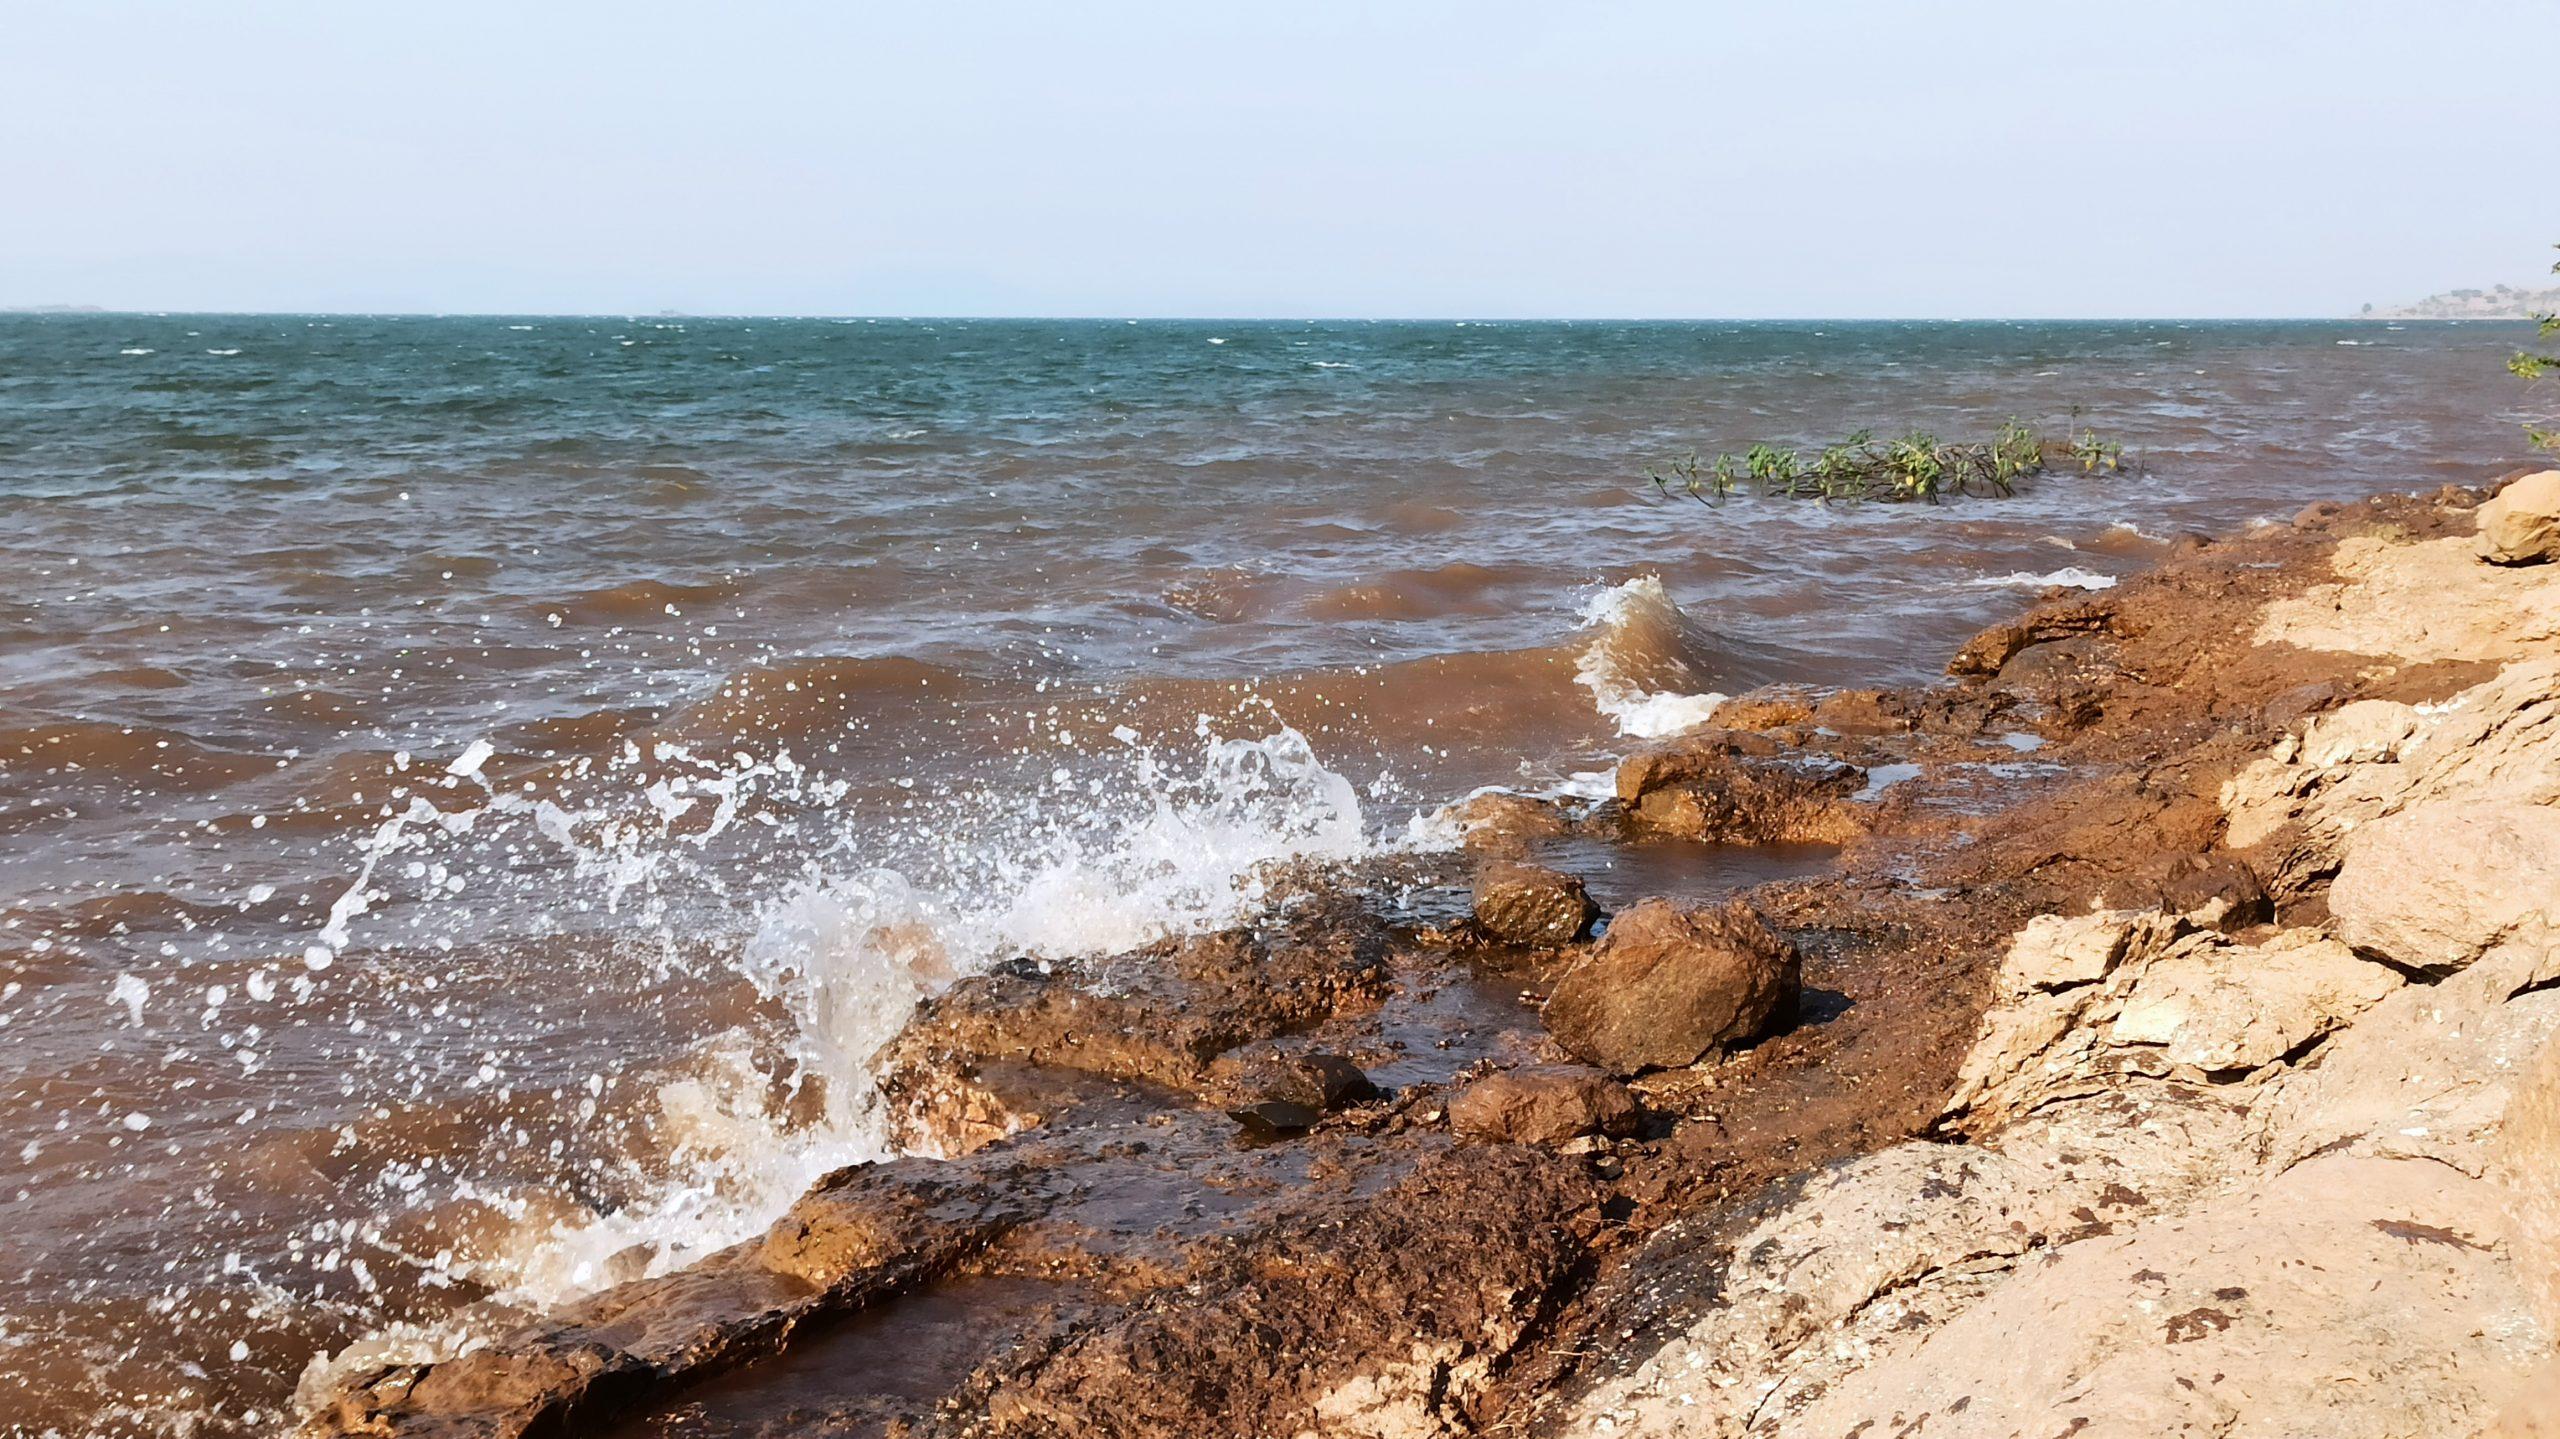 Beach water splashing on the rocks at shore